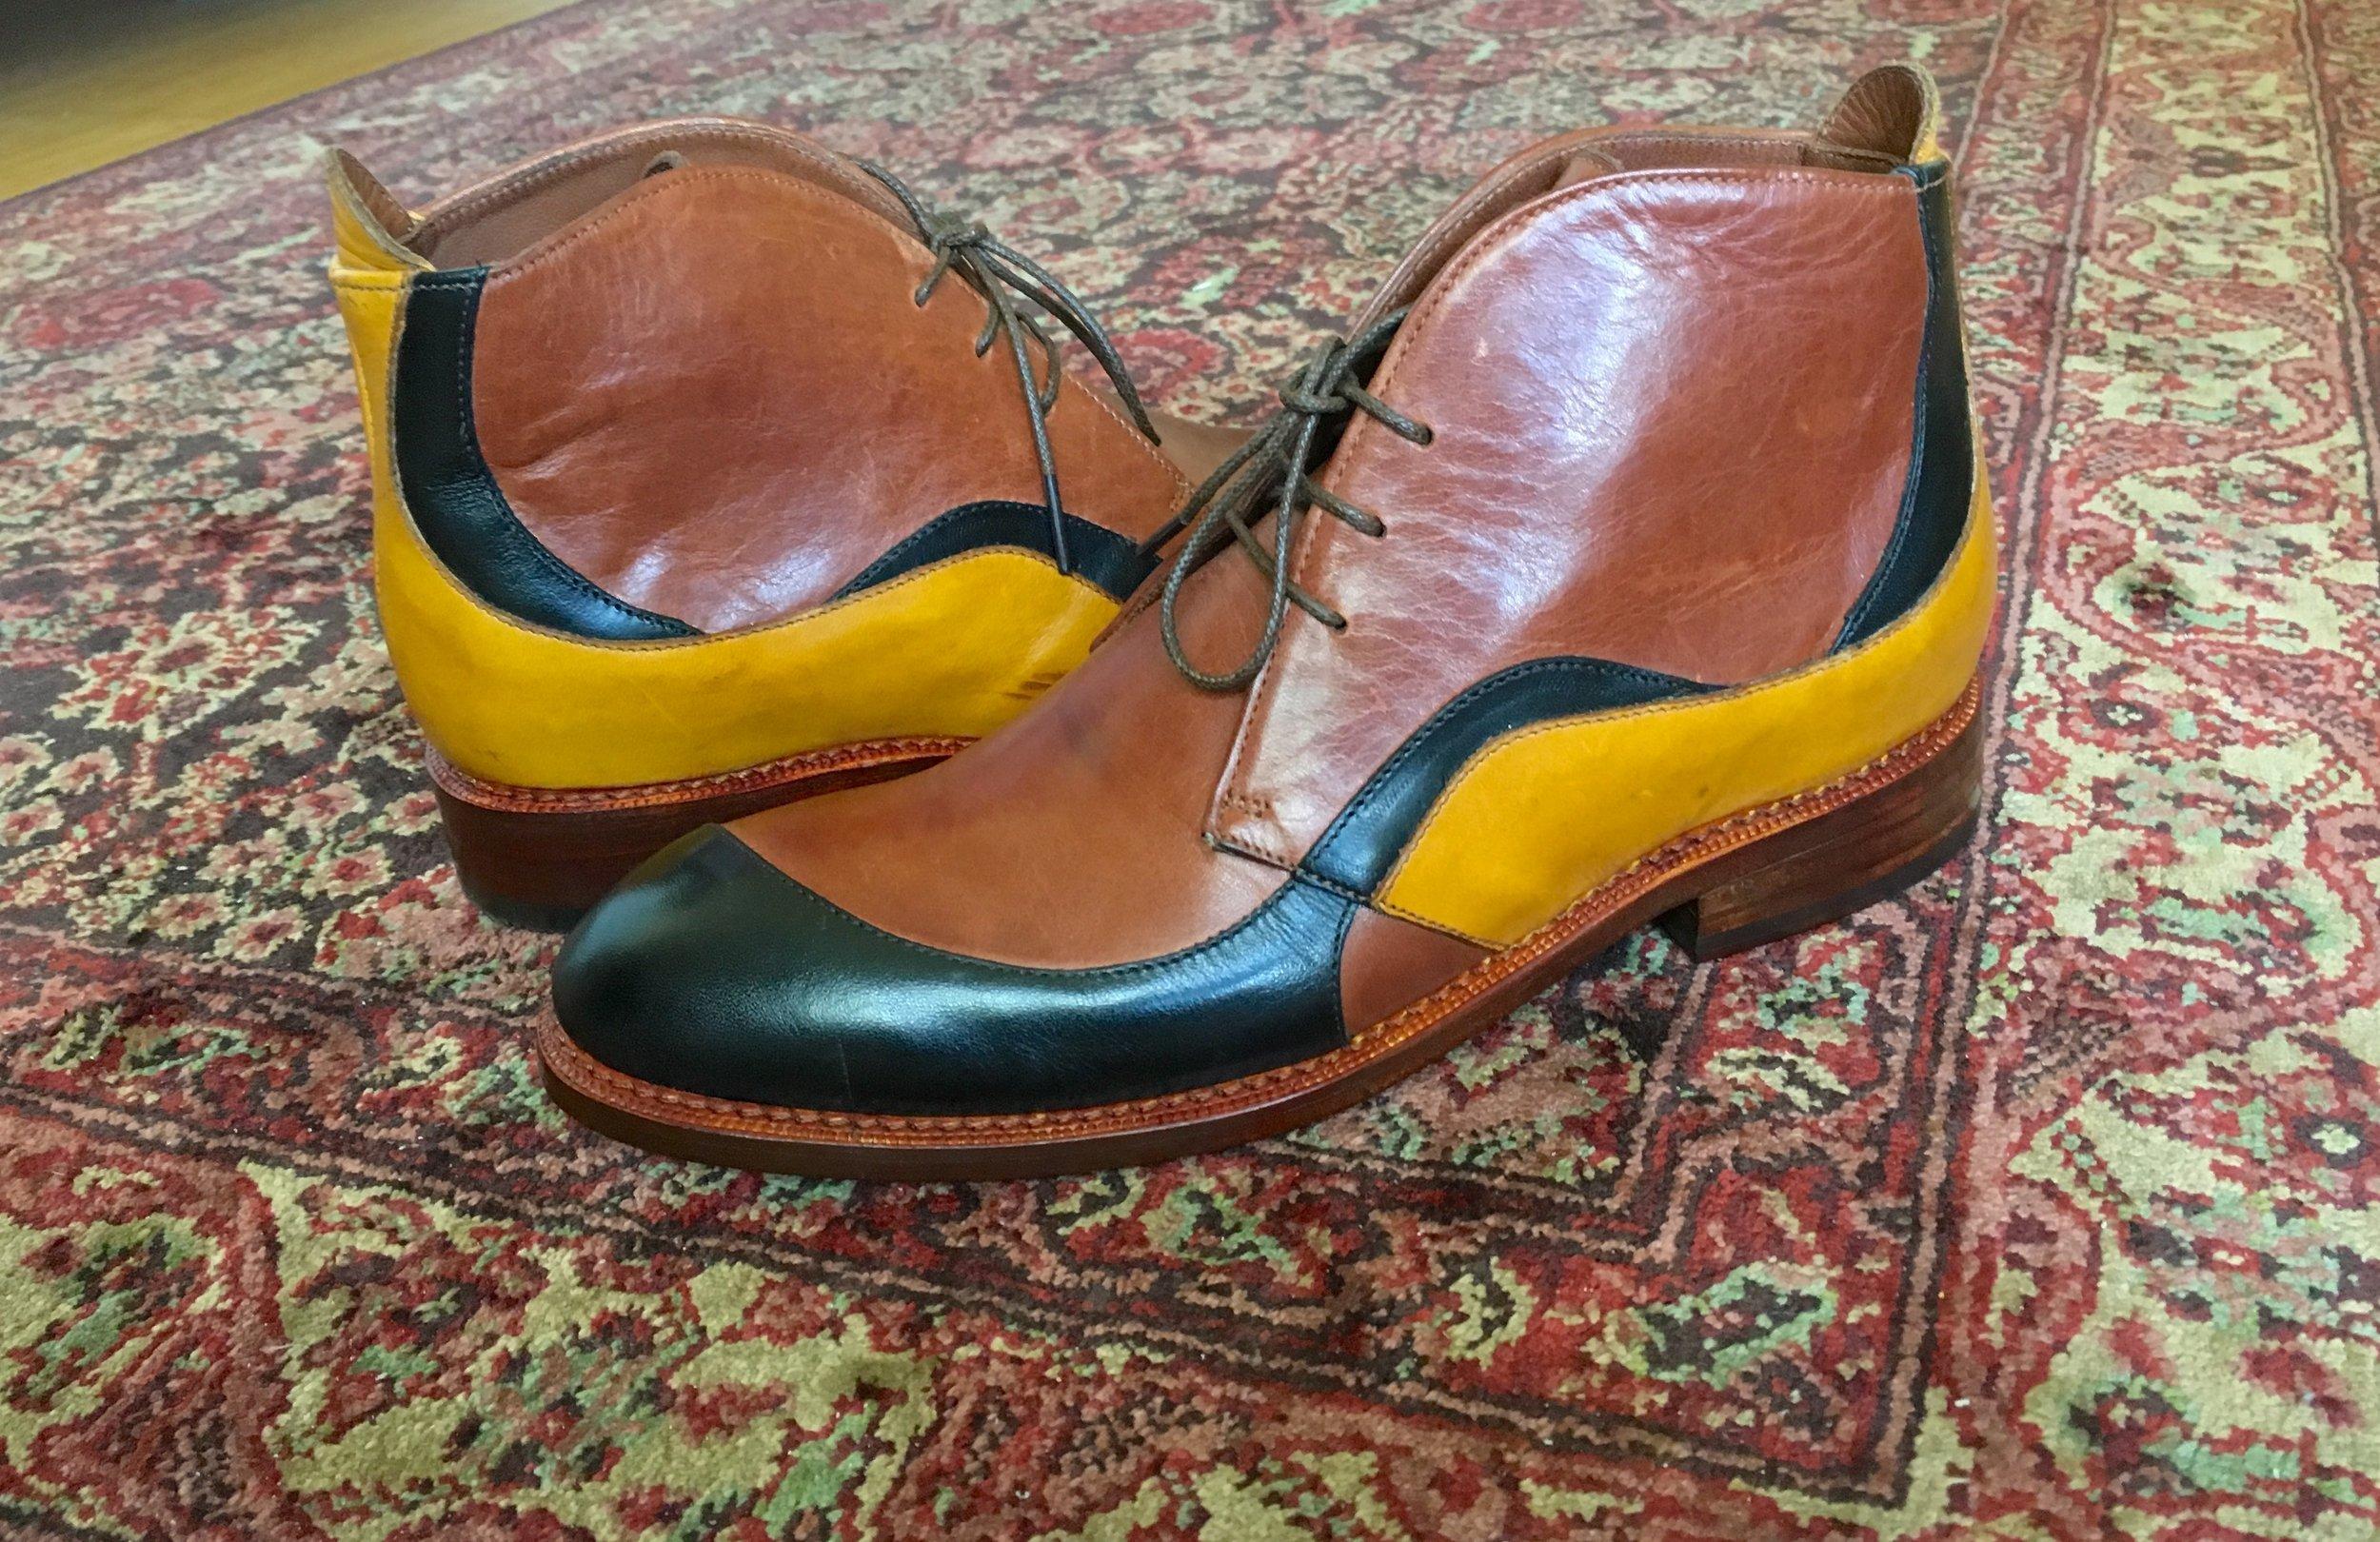 shoes 1.jpg